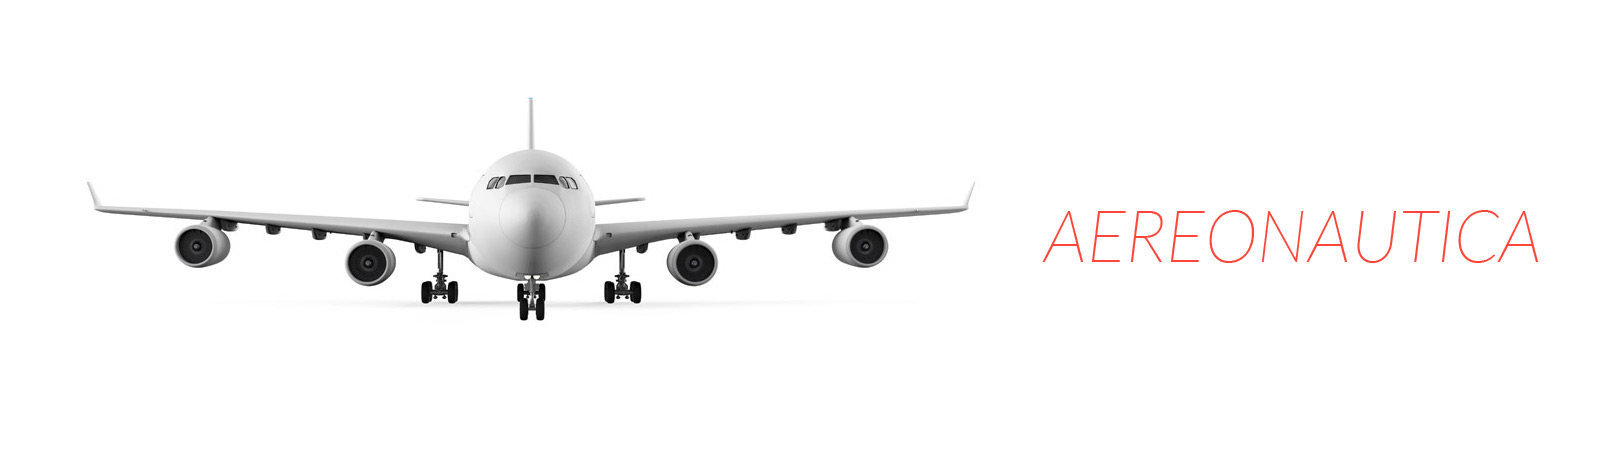 aereonautica_slide_wText